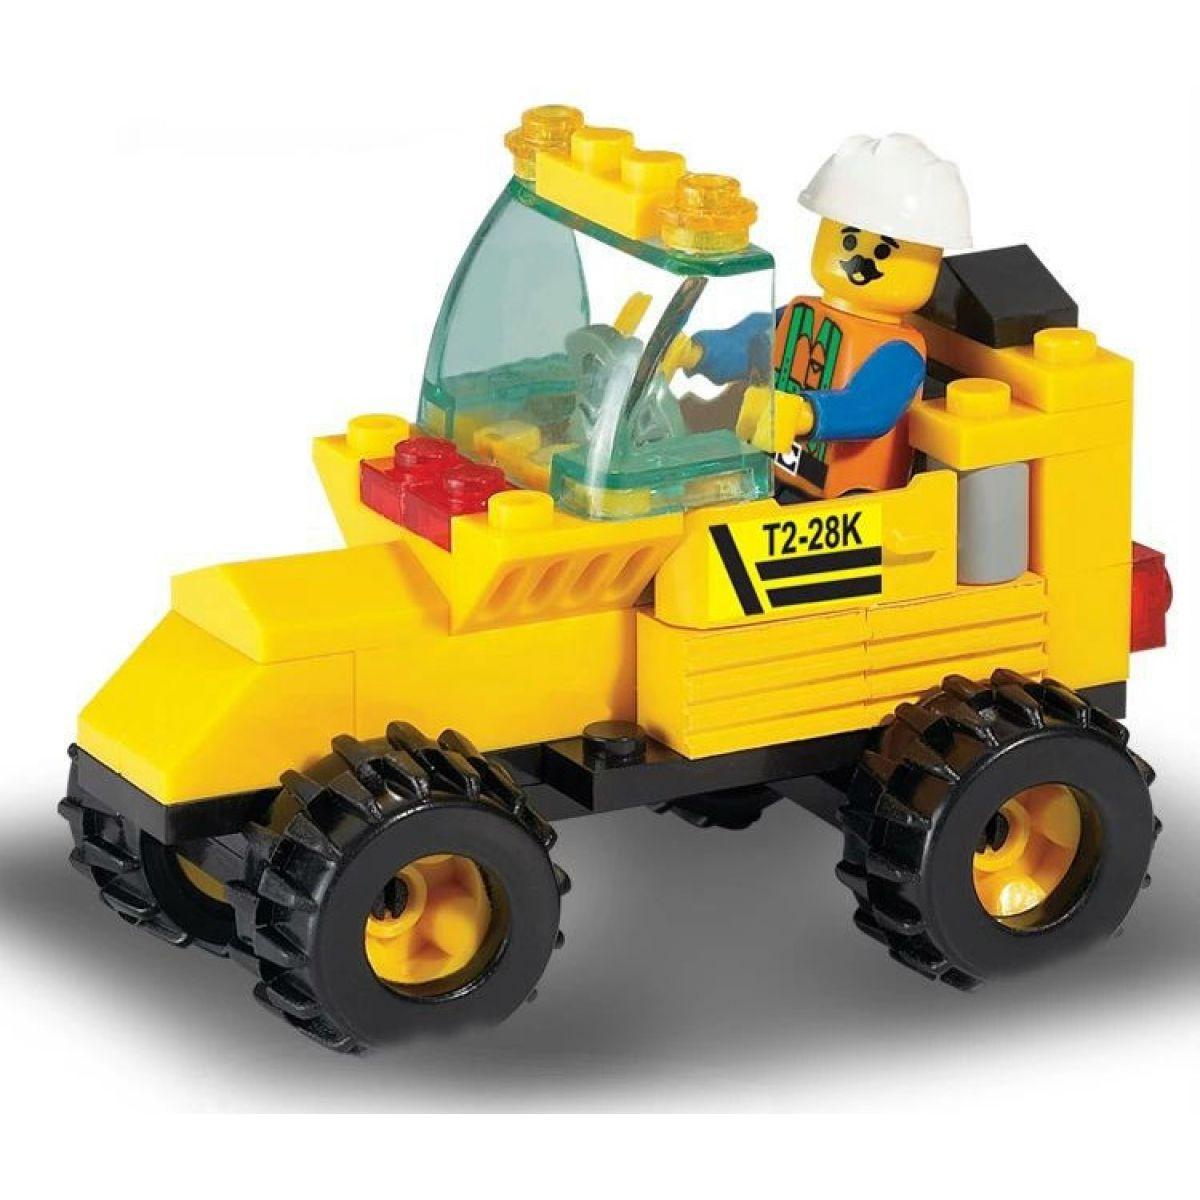 Sluban Stavebnice Traktor #3